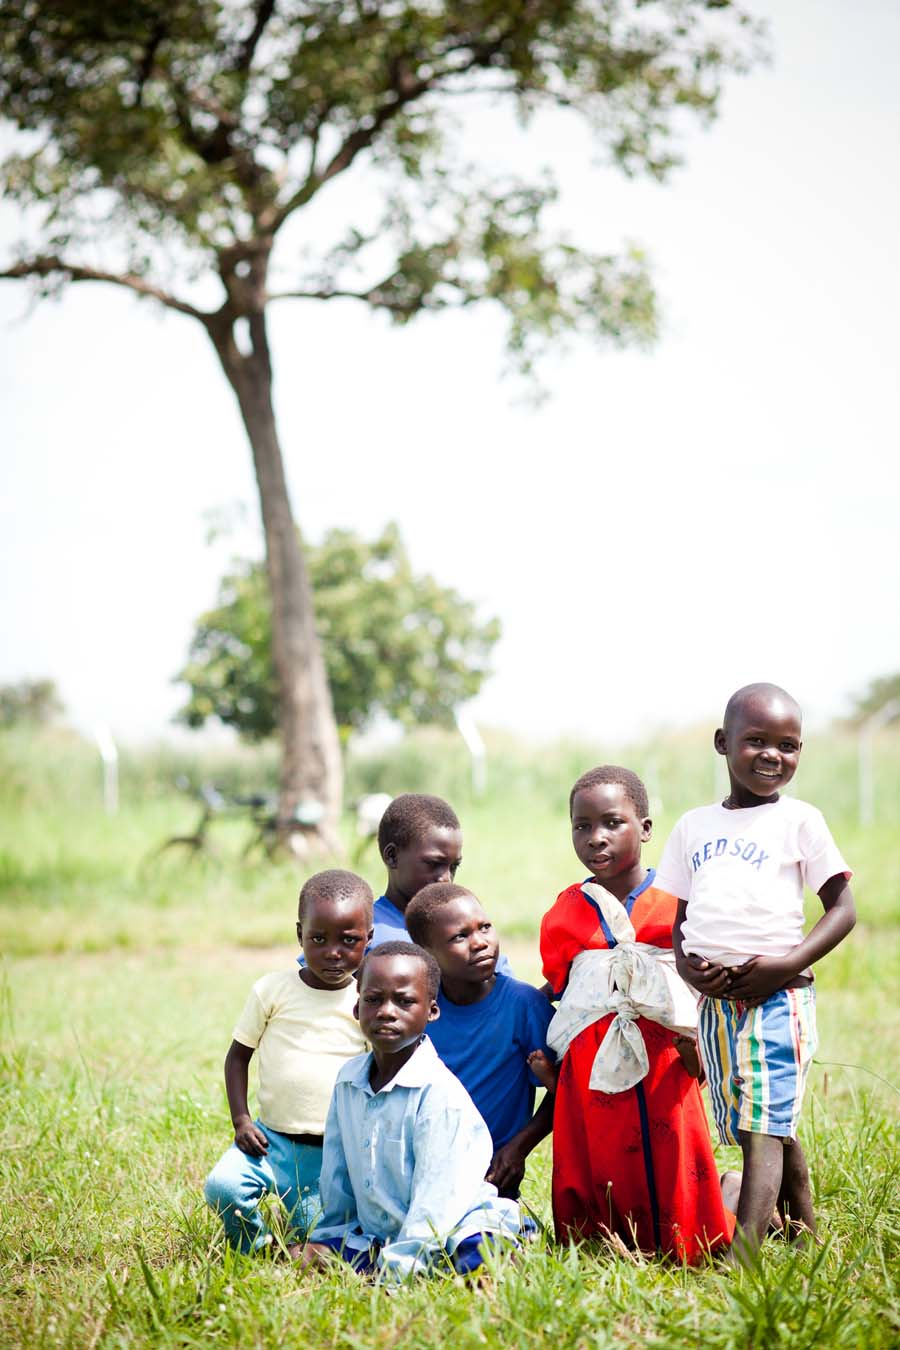 jessicadavisphotography.com | Jessica Davis Photography | Portrait Work in Uganda| Travel Photographer | World Event Photographs 2.jpg